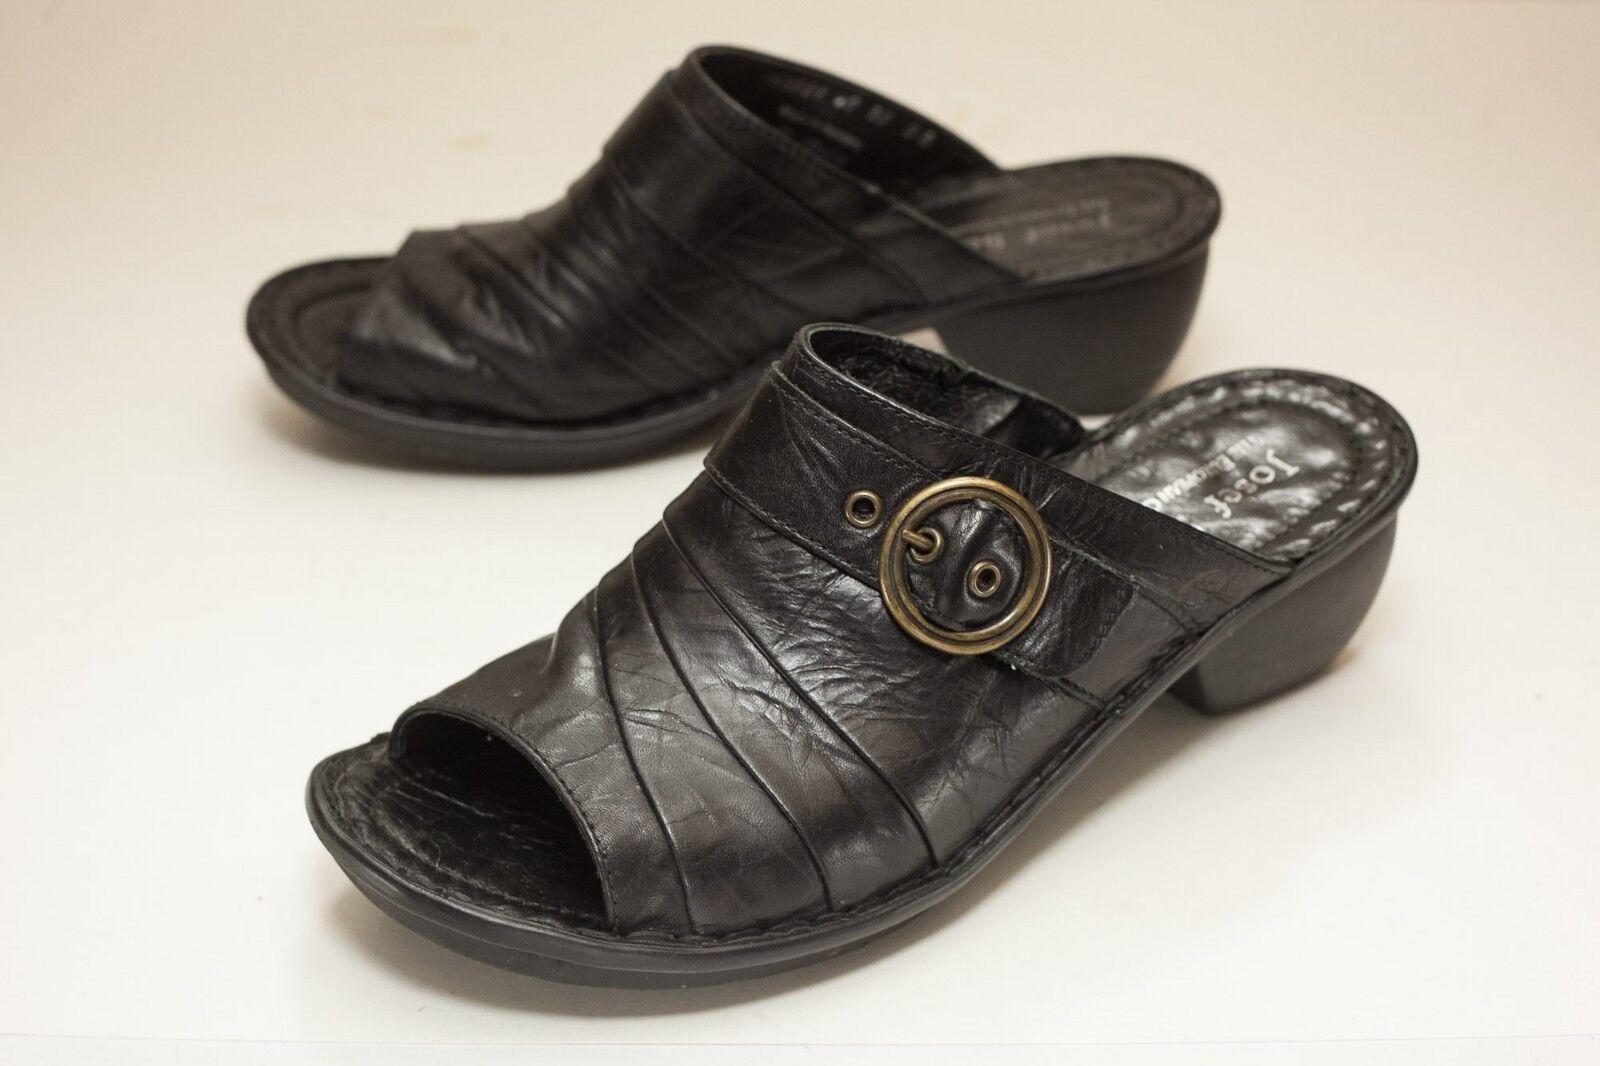 Josef Seibel US 8.5 Black Sandals Women's EUR 40